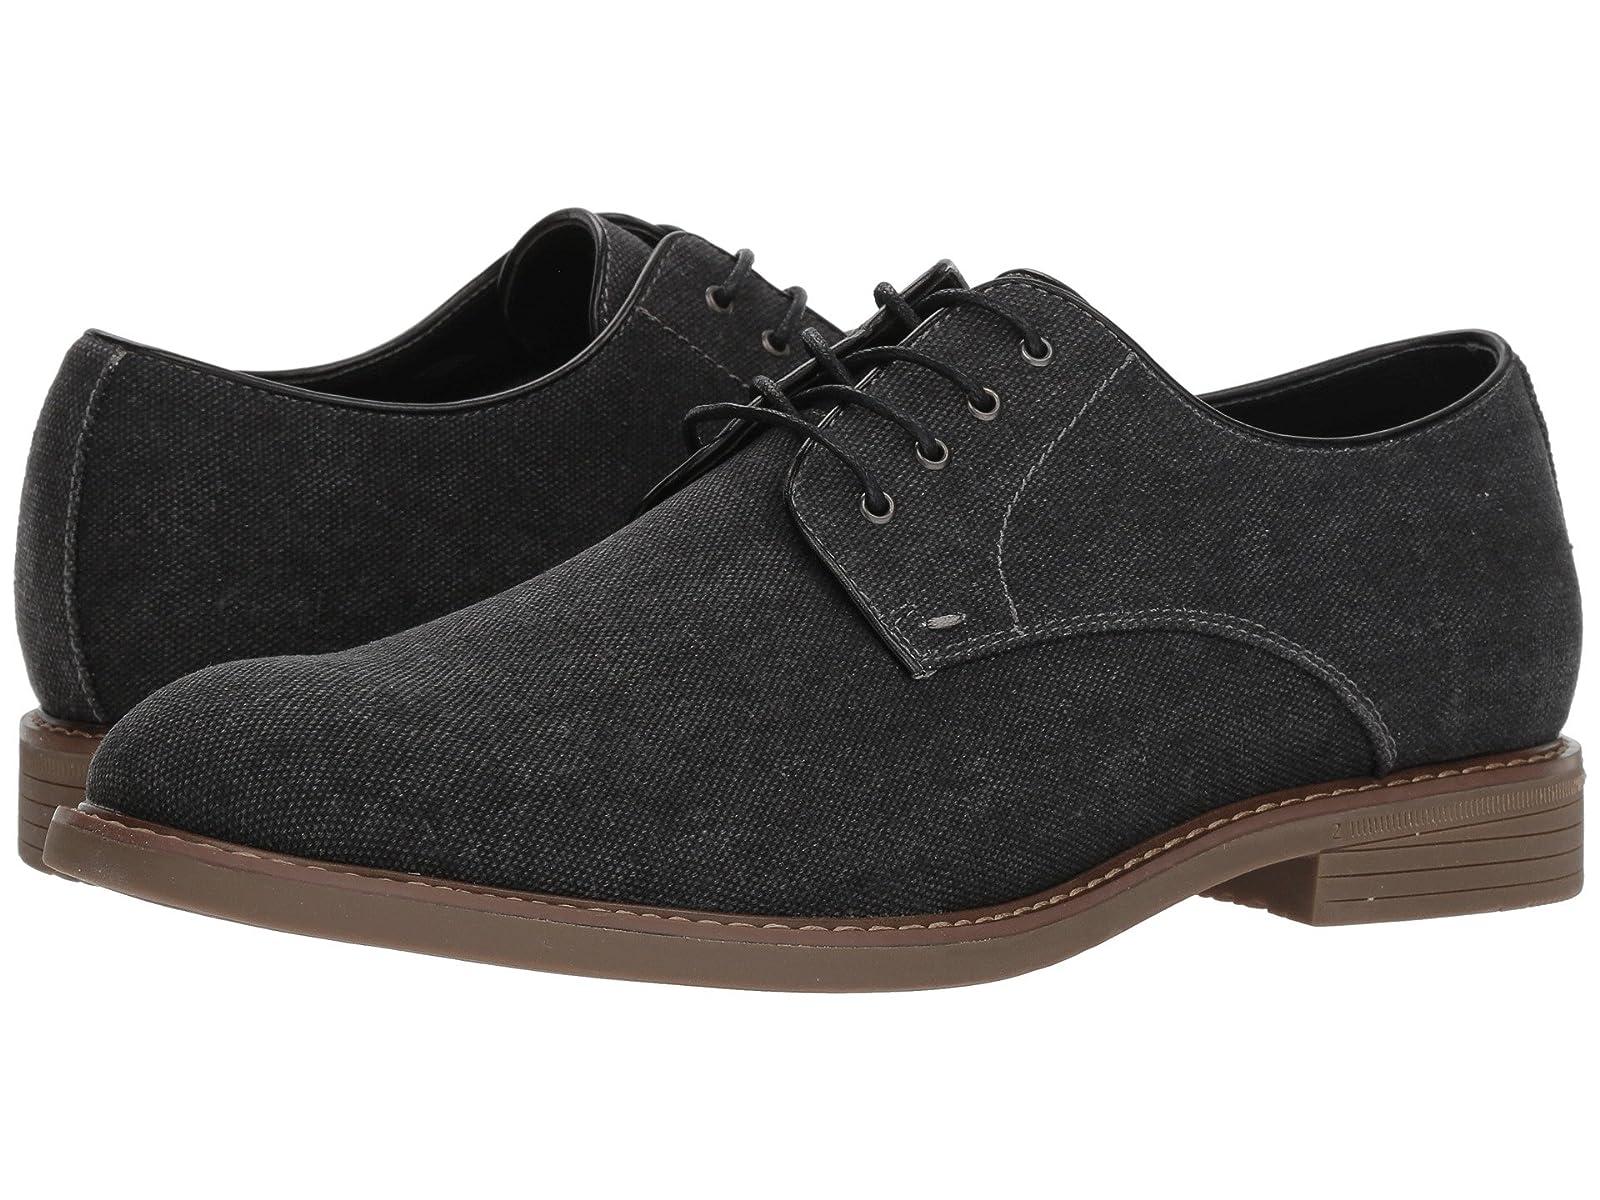 IZOD ImageCheap and distinctive eye-catching shoes